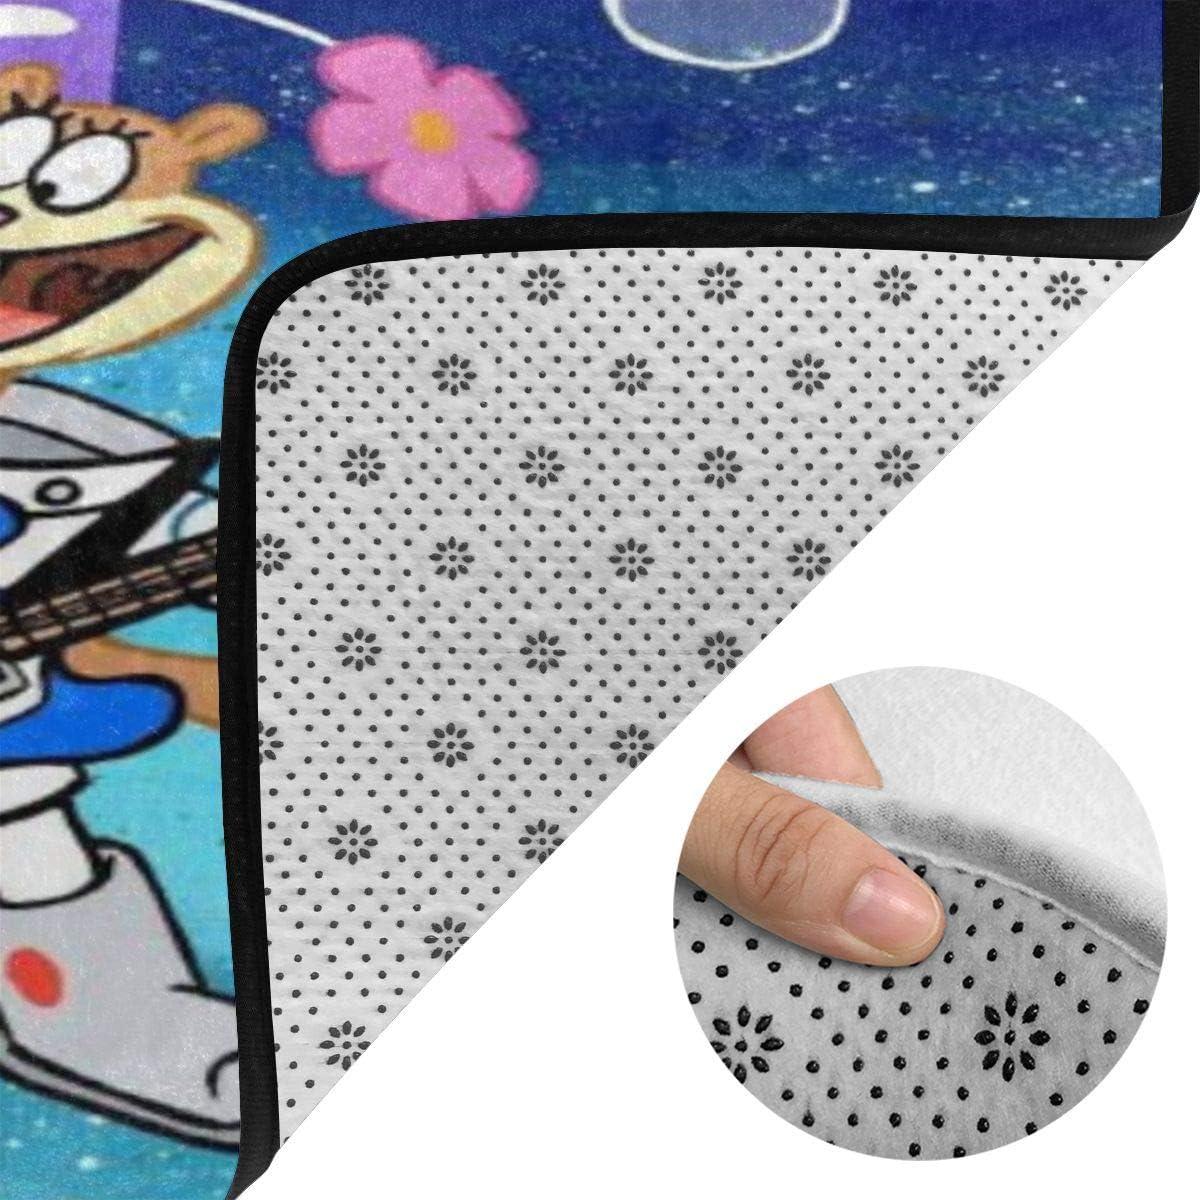 Beautiful Spongebob Squarepants Super Soft Modern Non-Slip Living Room Rug